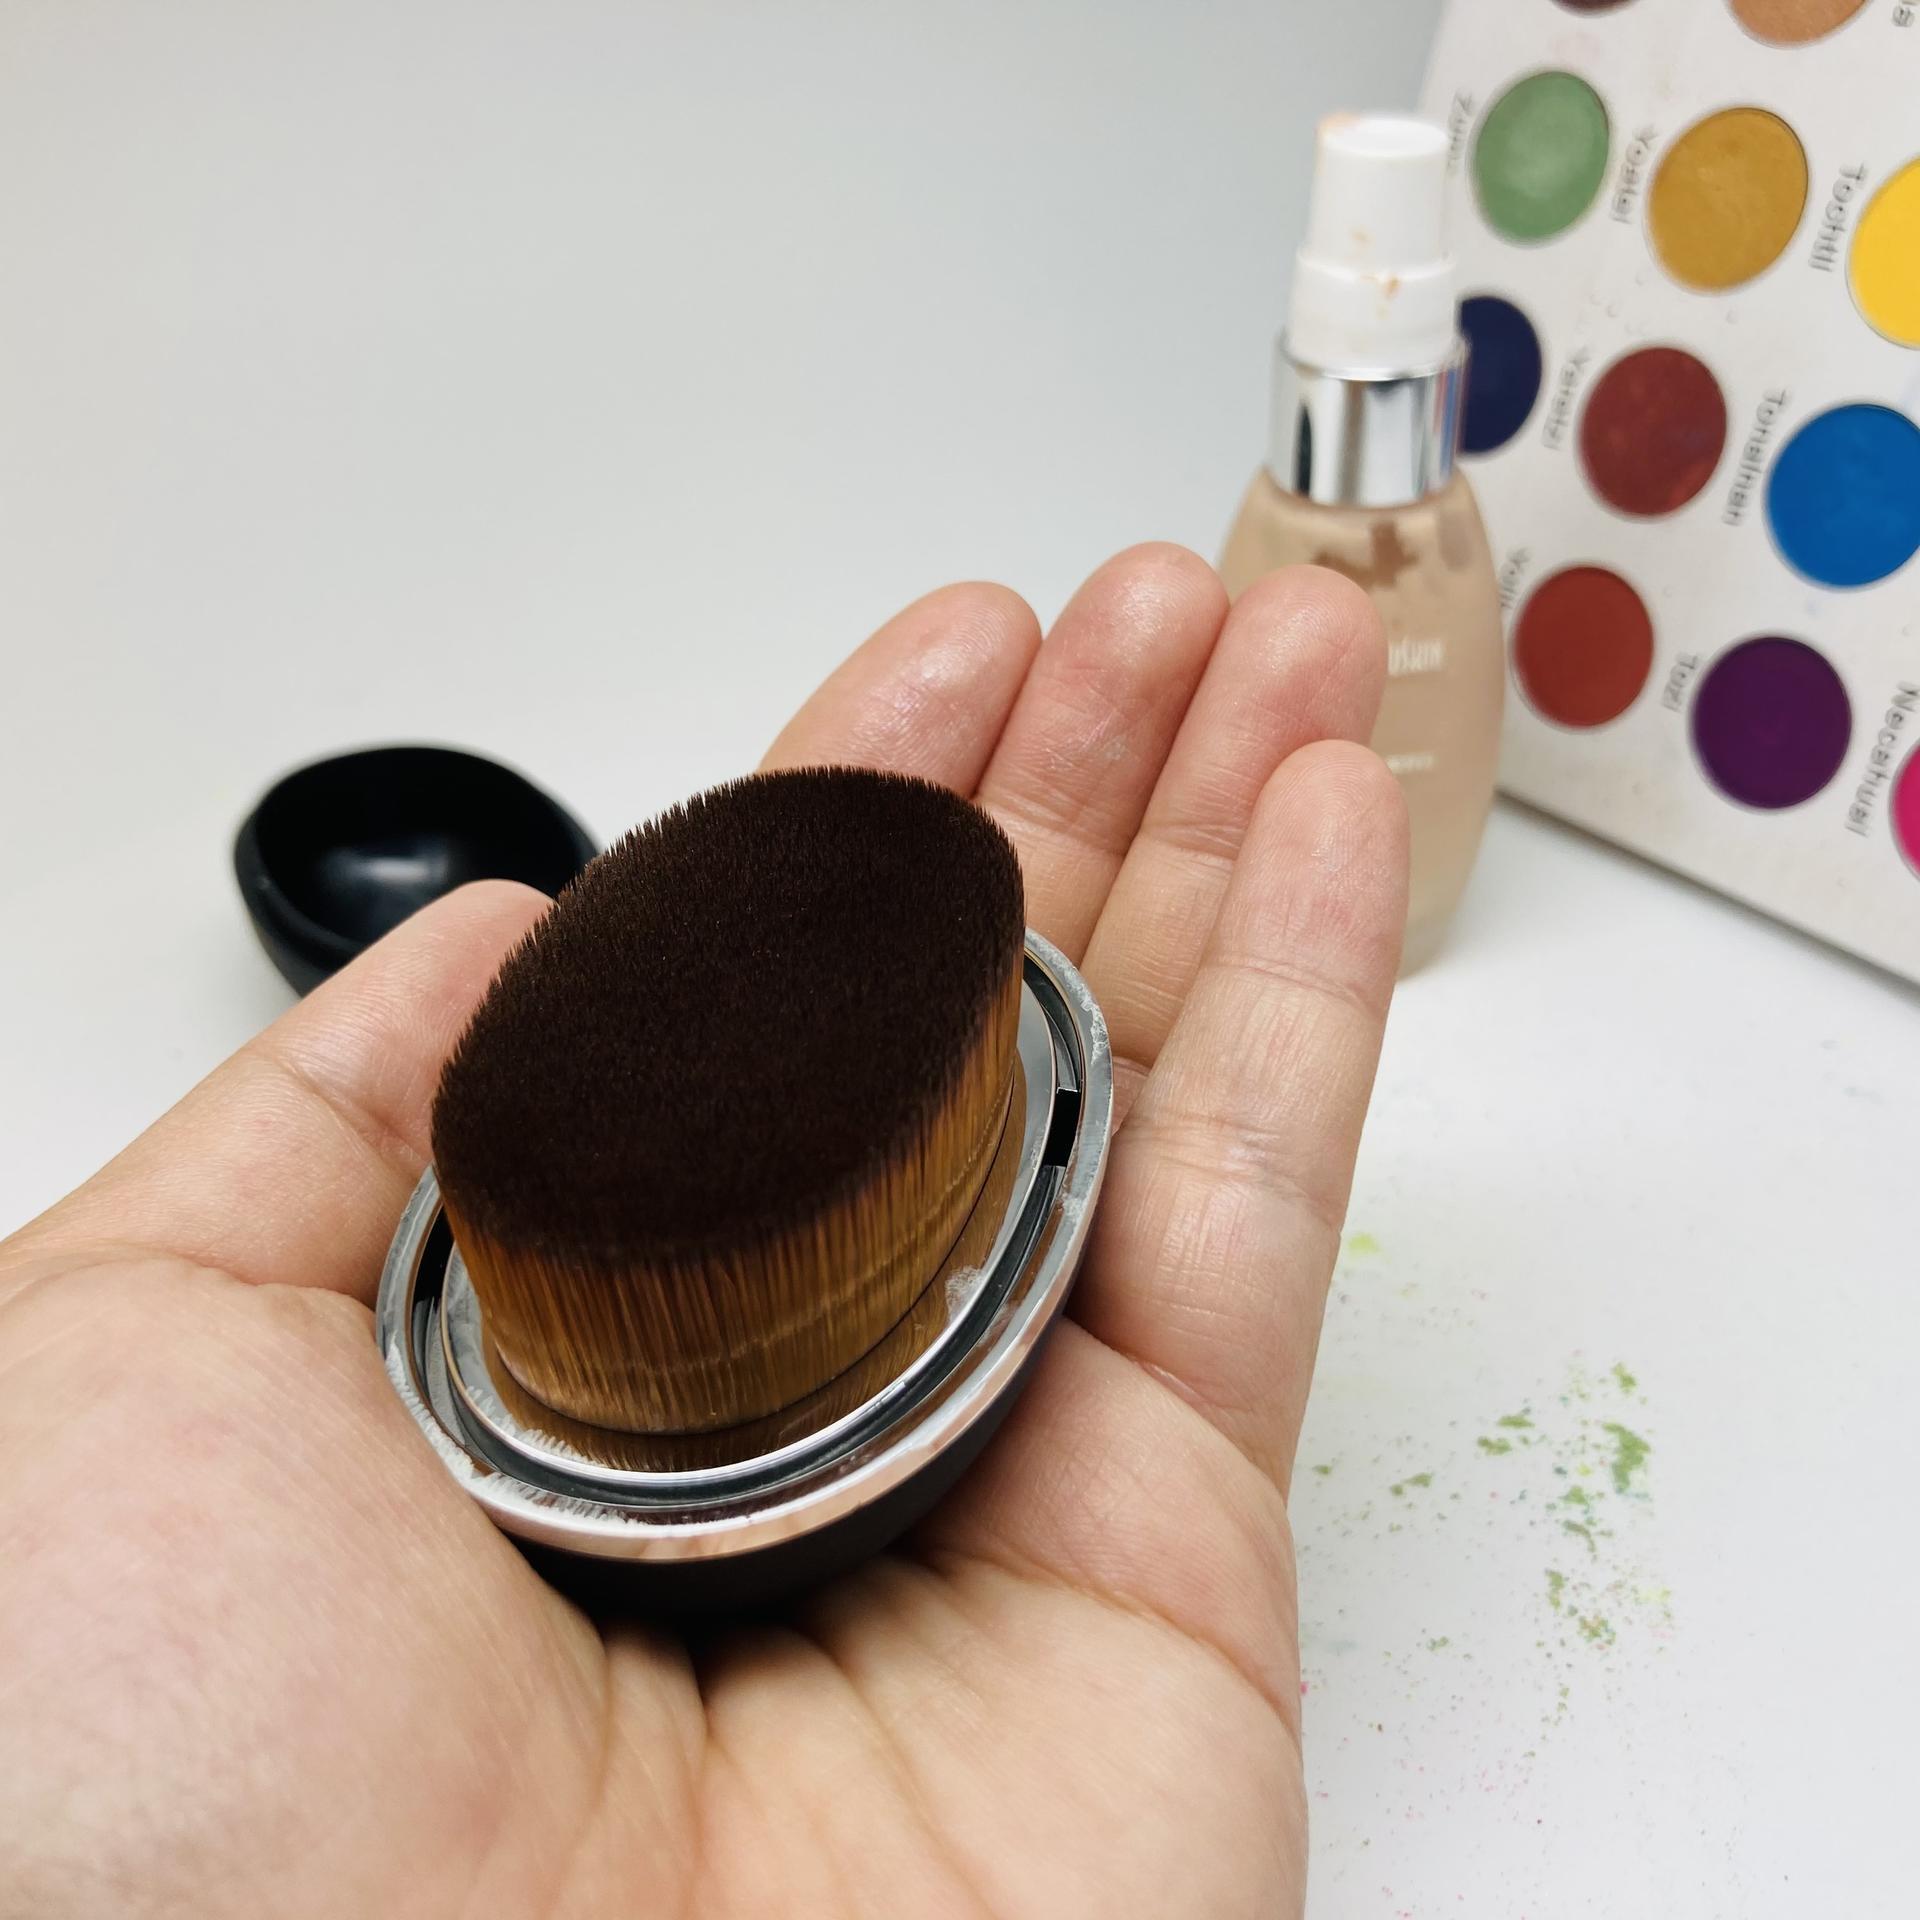 New Oval plastic magic box cute cosmetic powder foundation makeup brush manufacture